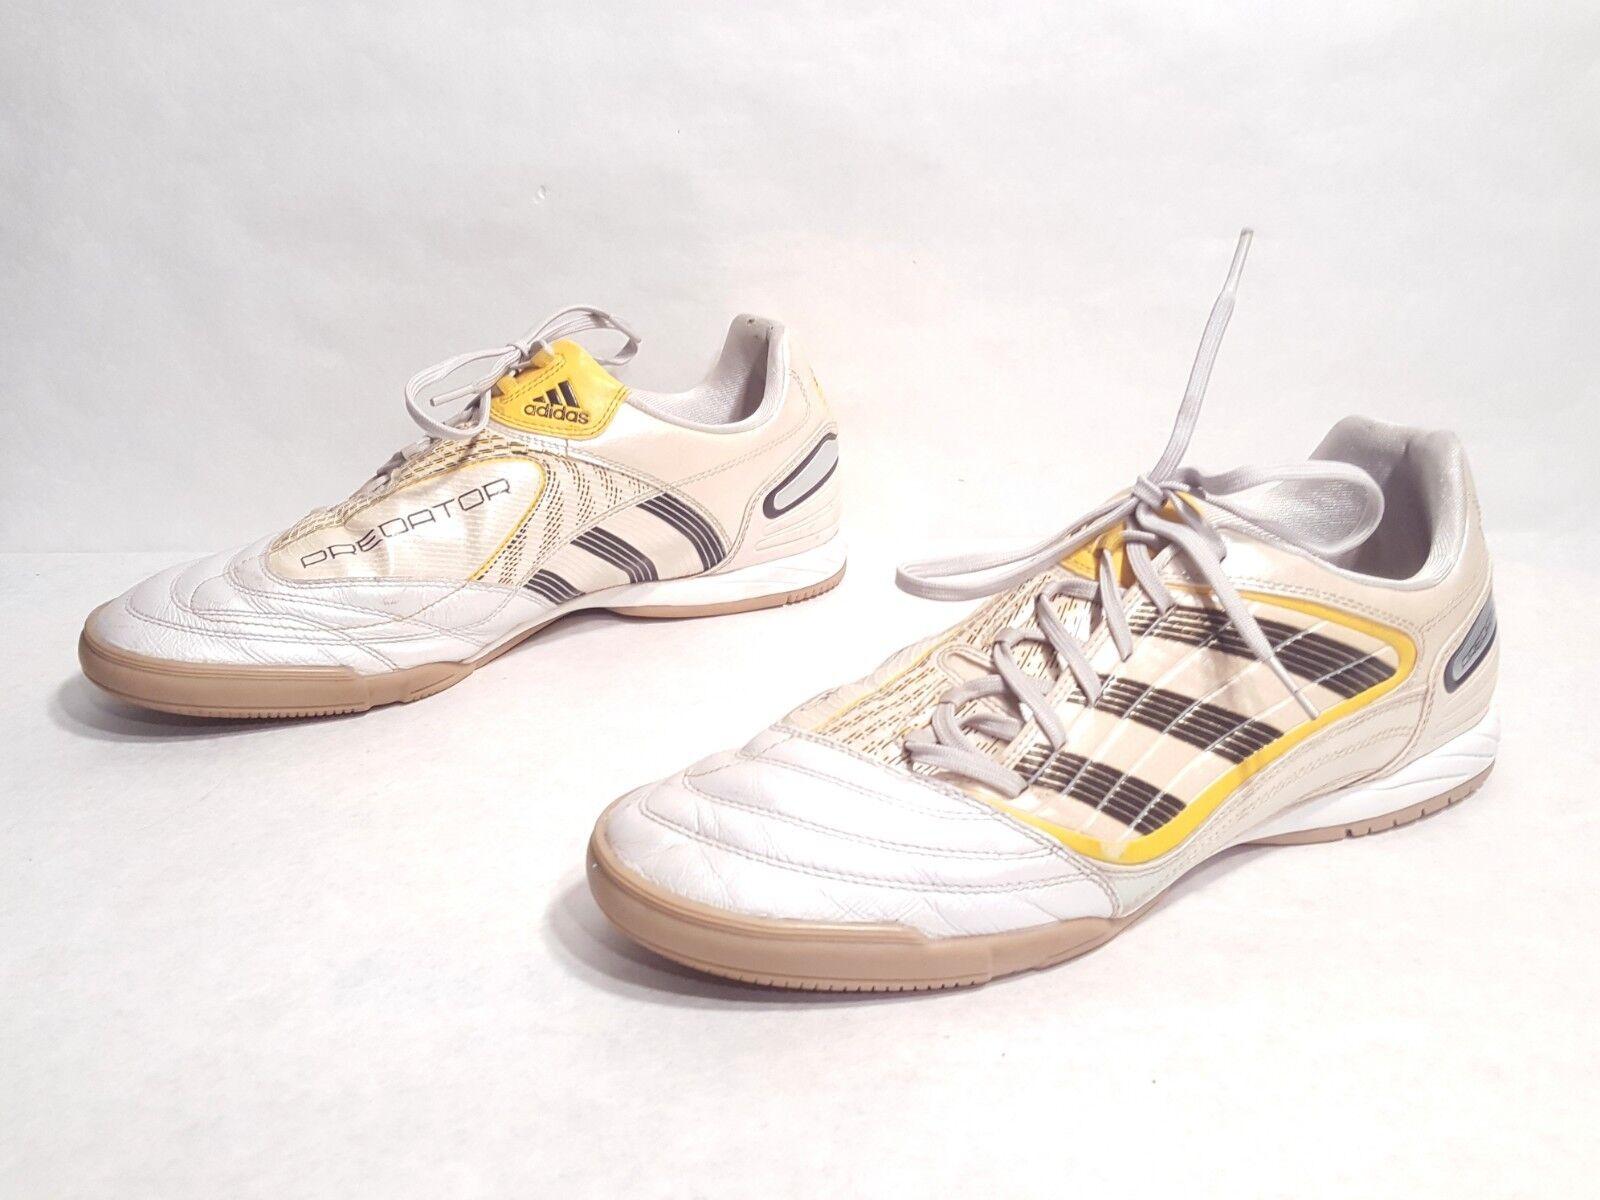 EUC Adidas Predator Absolado X Indoor Soccer shoes White Yellow US 11.5